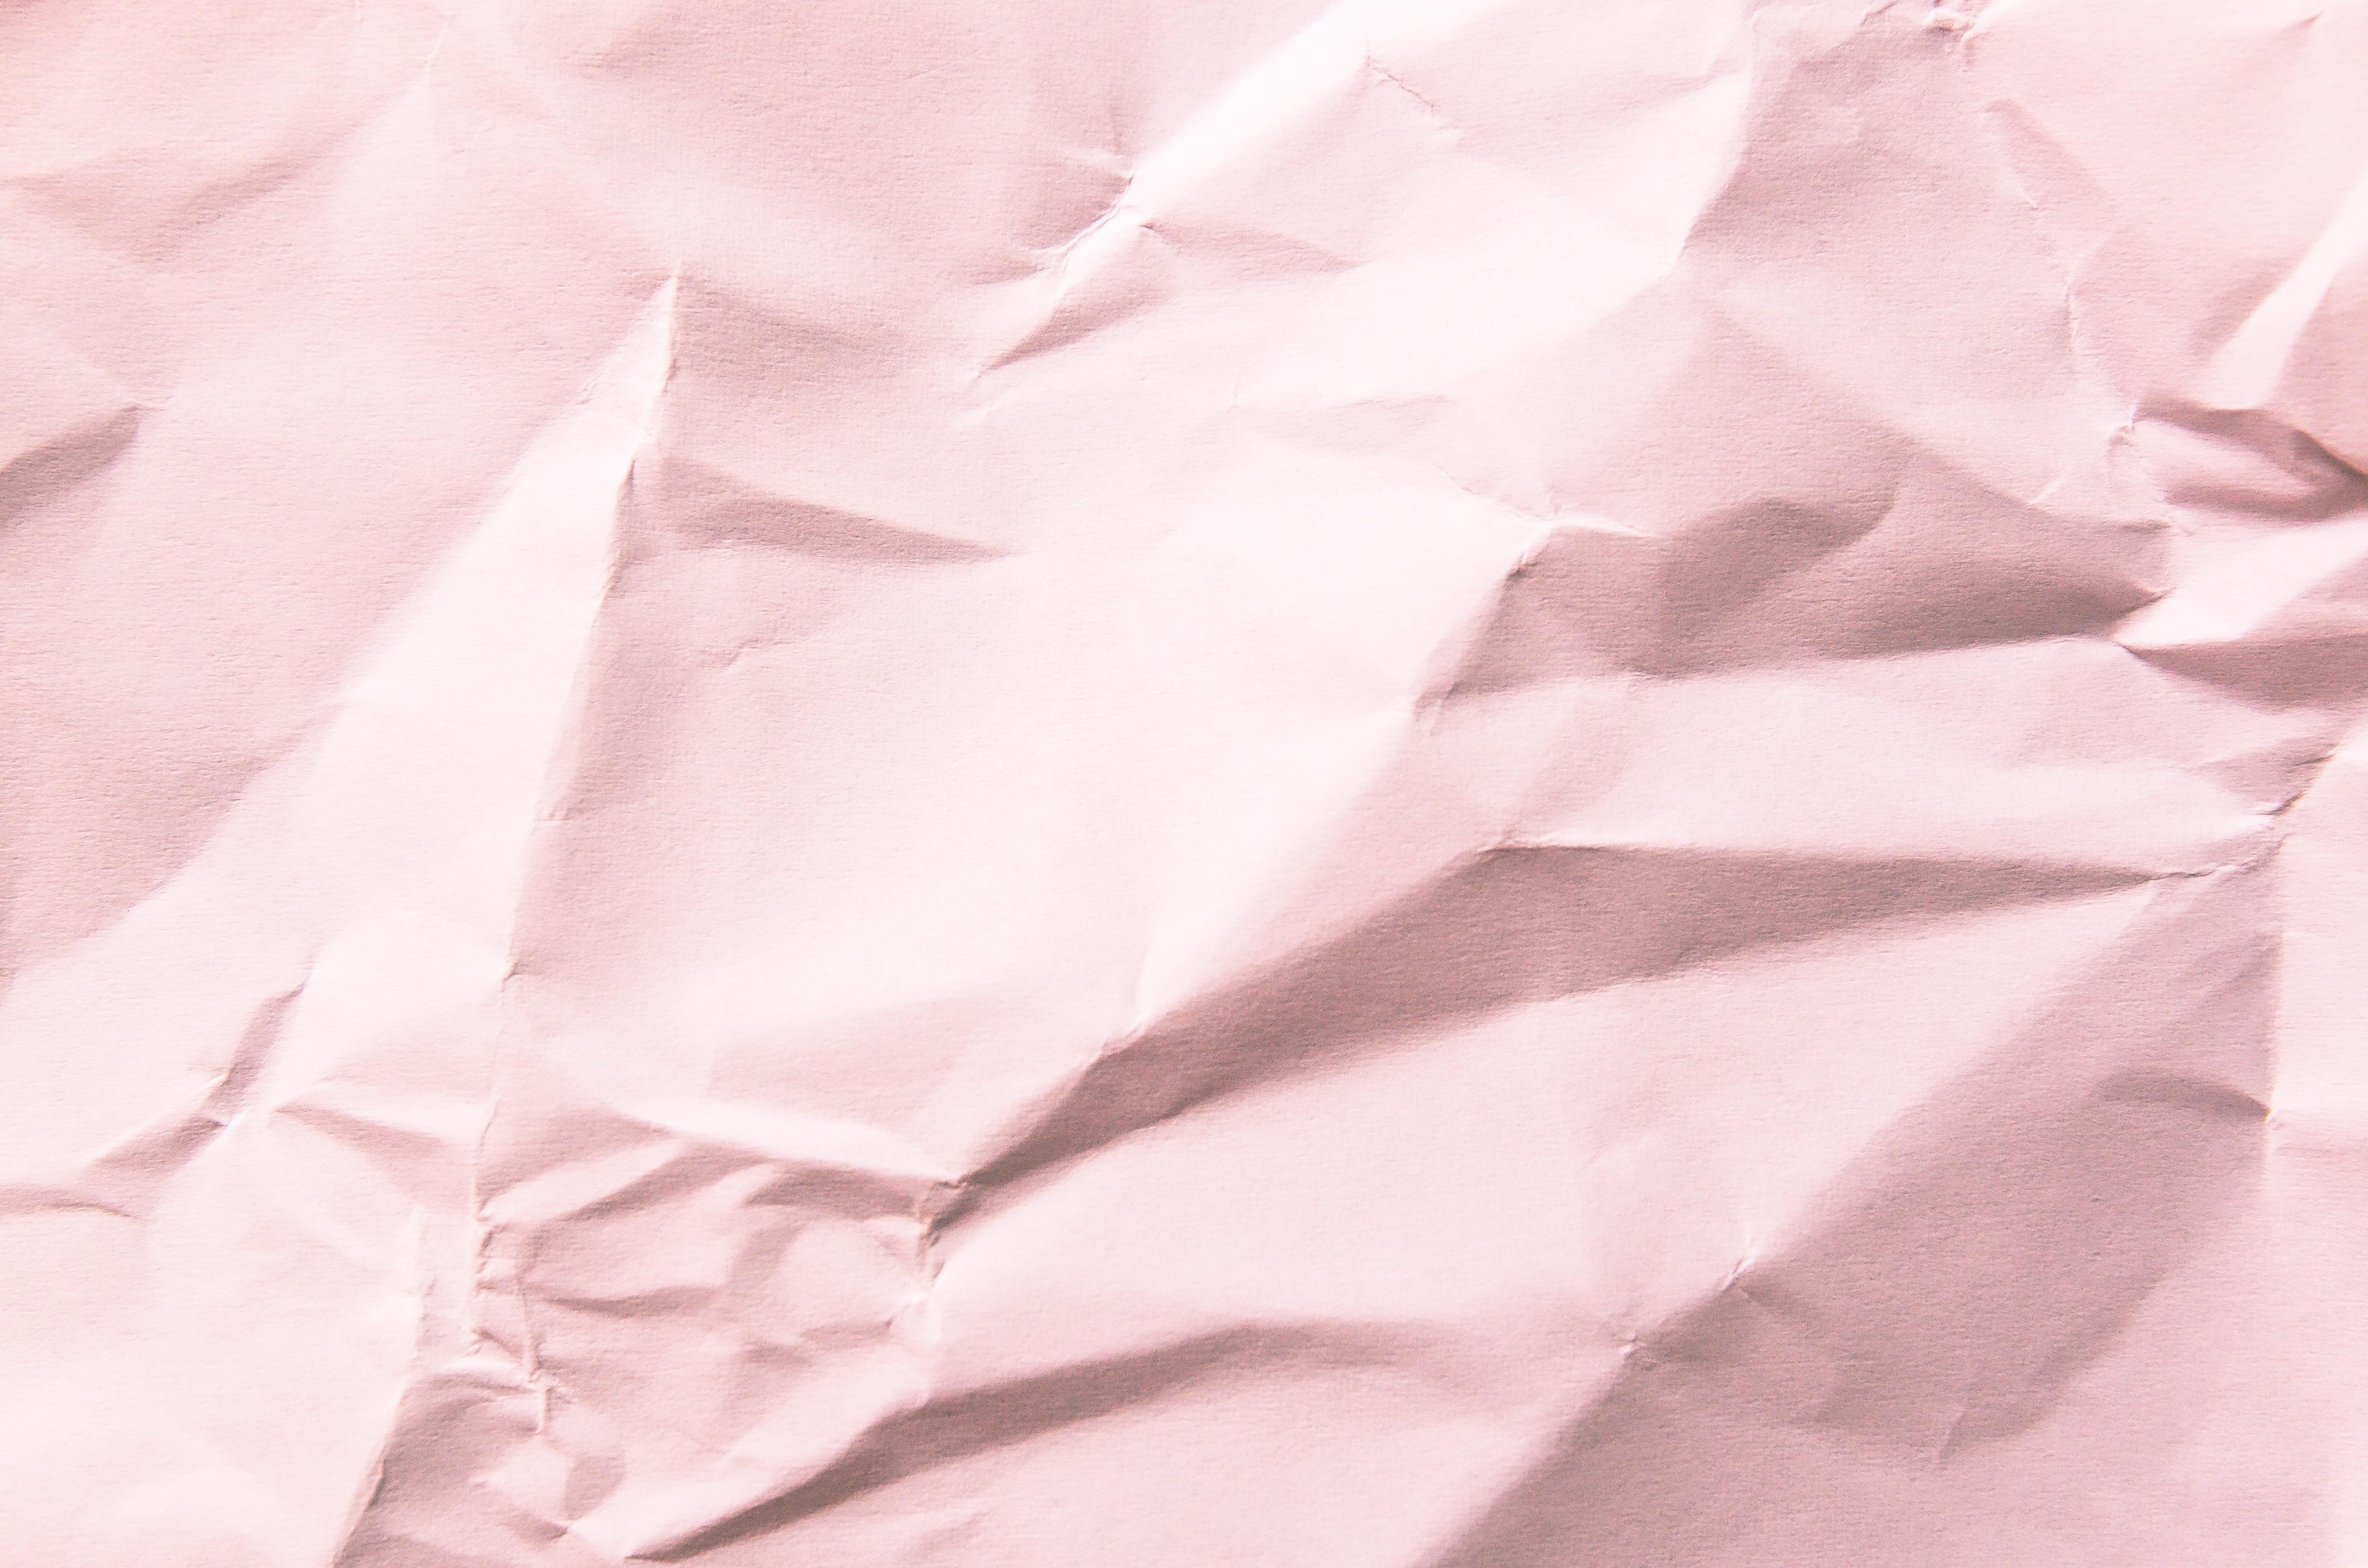 Crumpled Paper 2 free stock photo - Moni's Photo